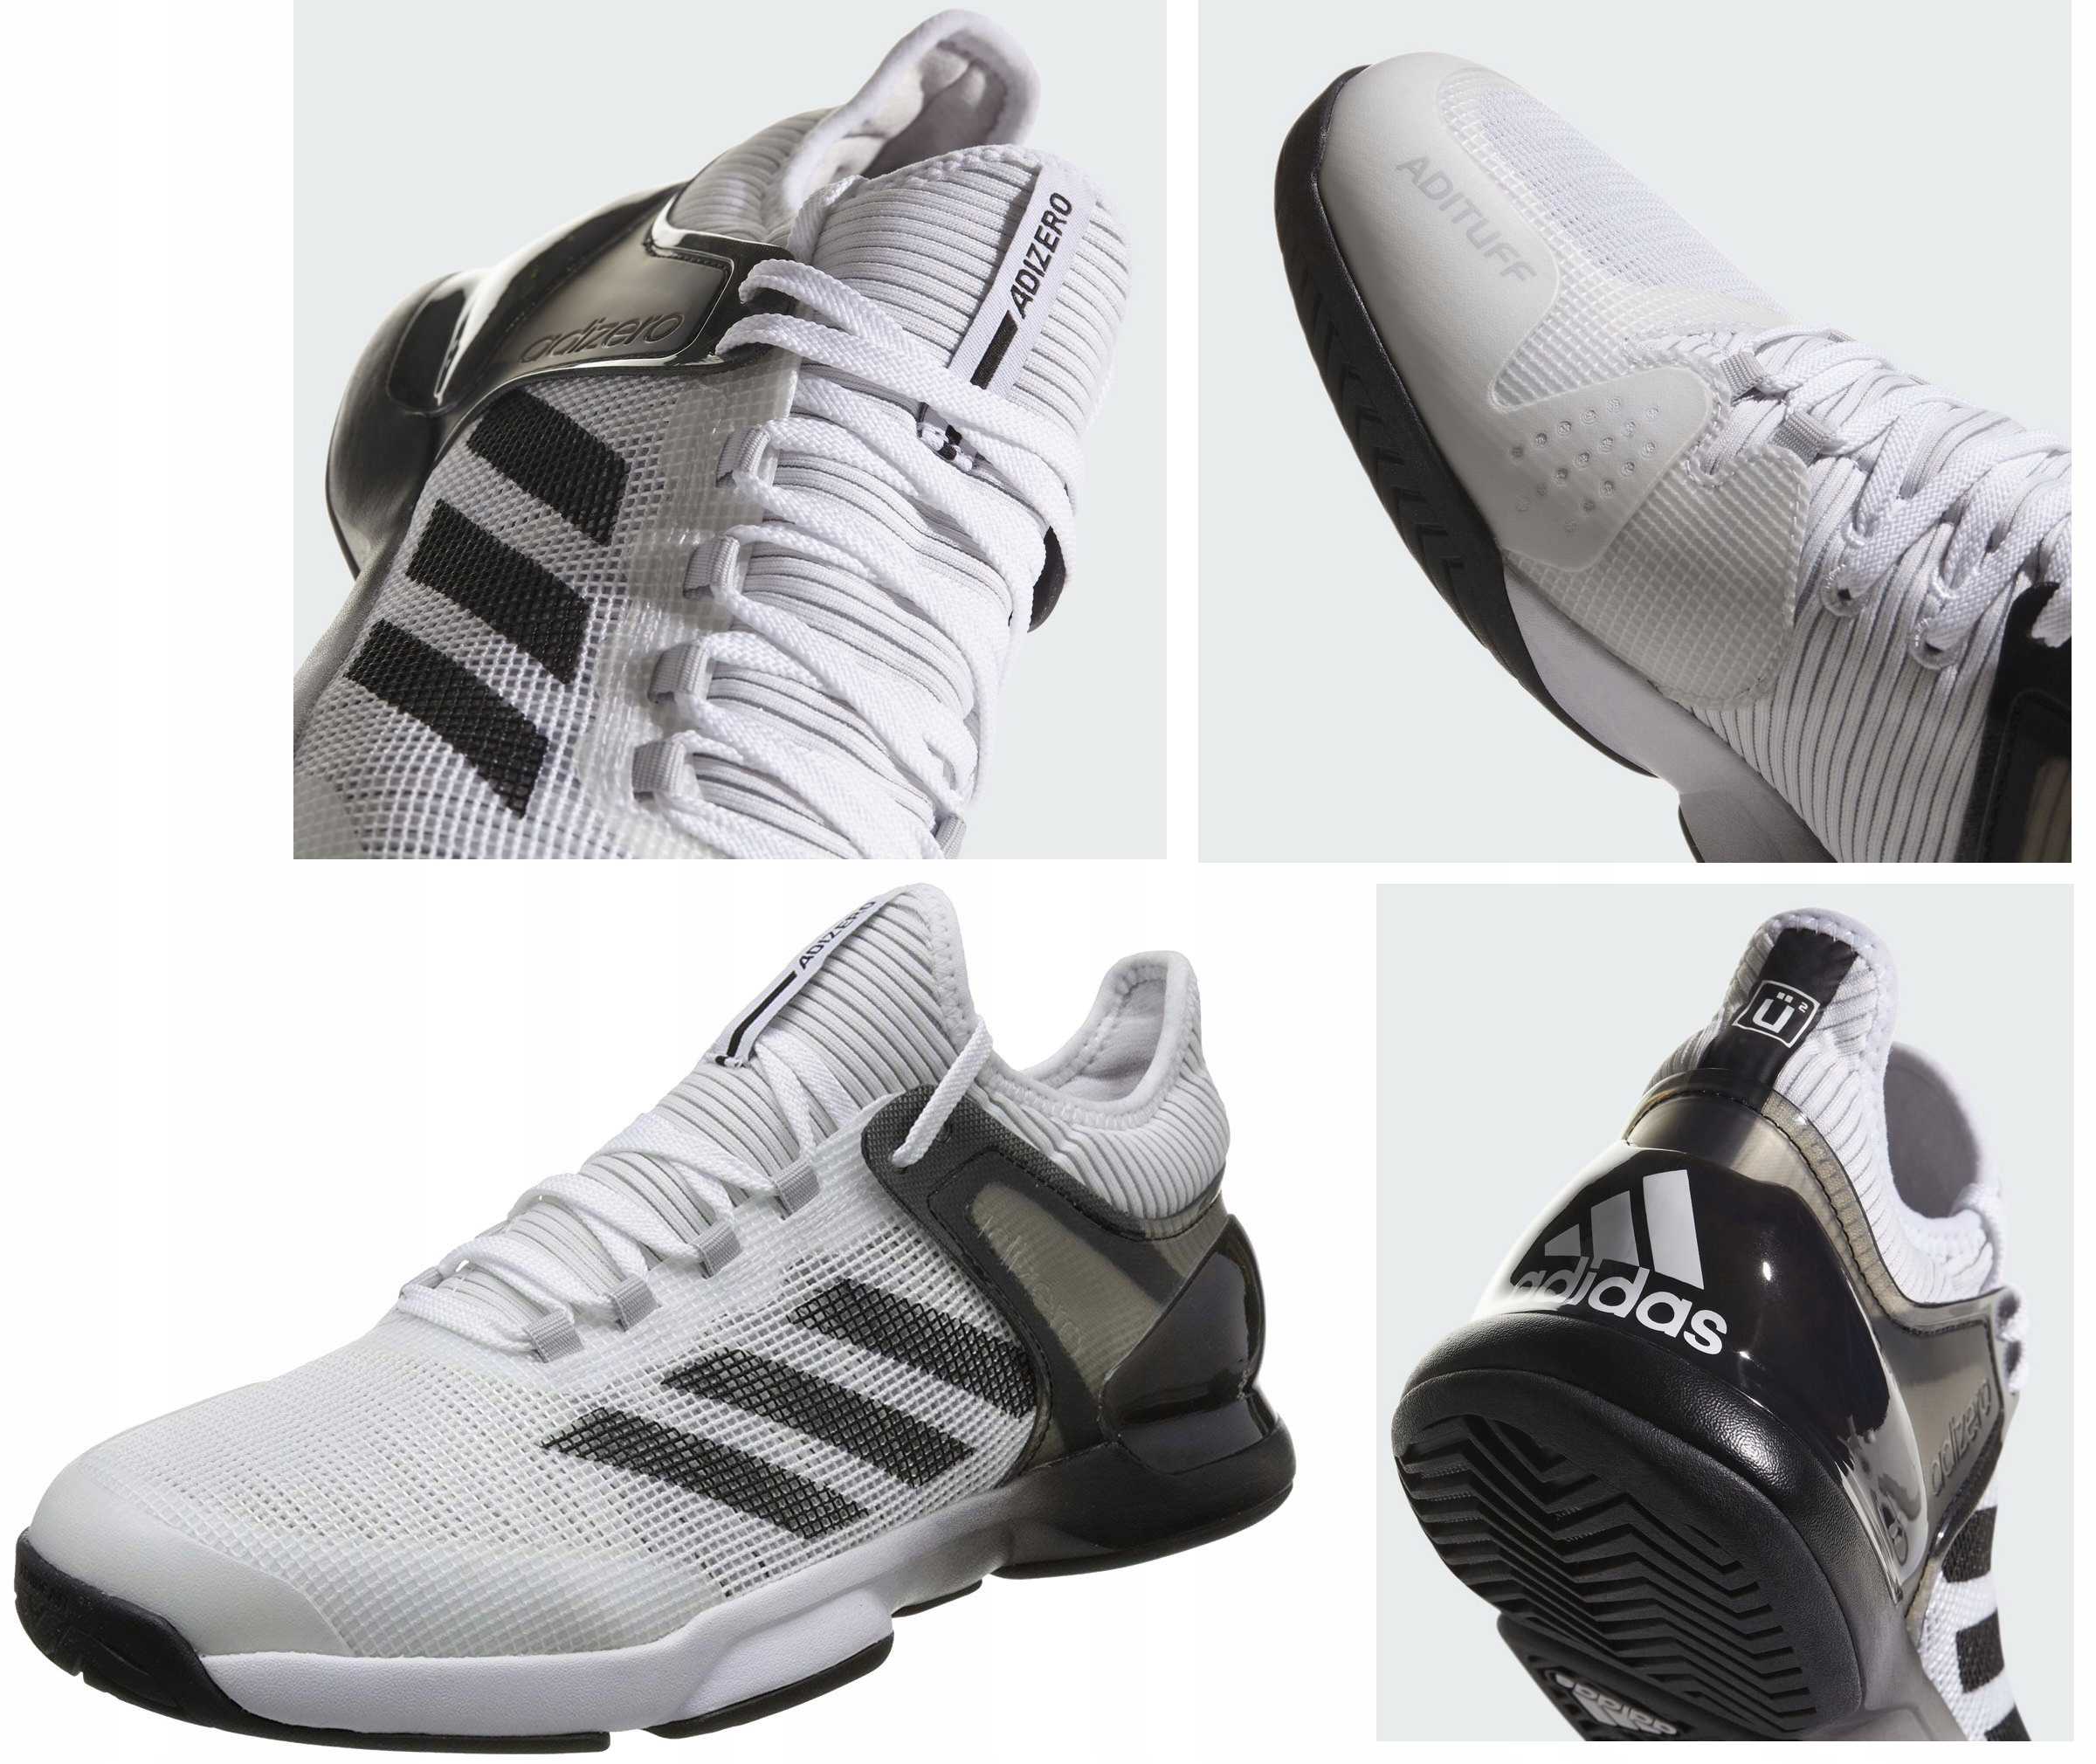 Adidas adiZero Ubersonic 2 buty tenisowe 43 13